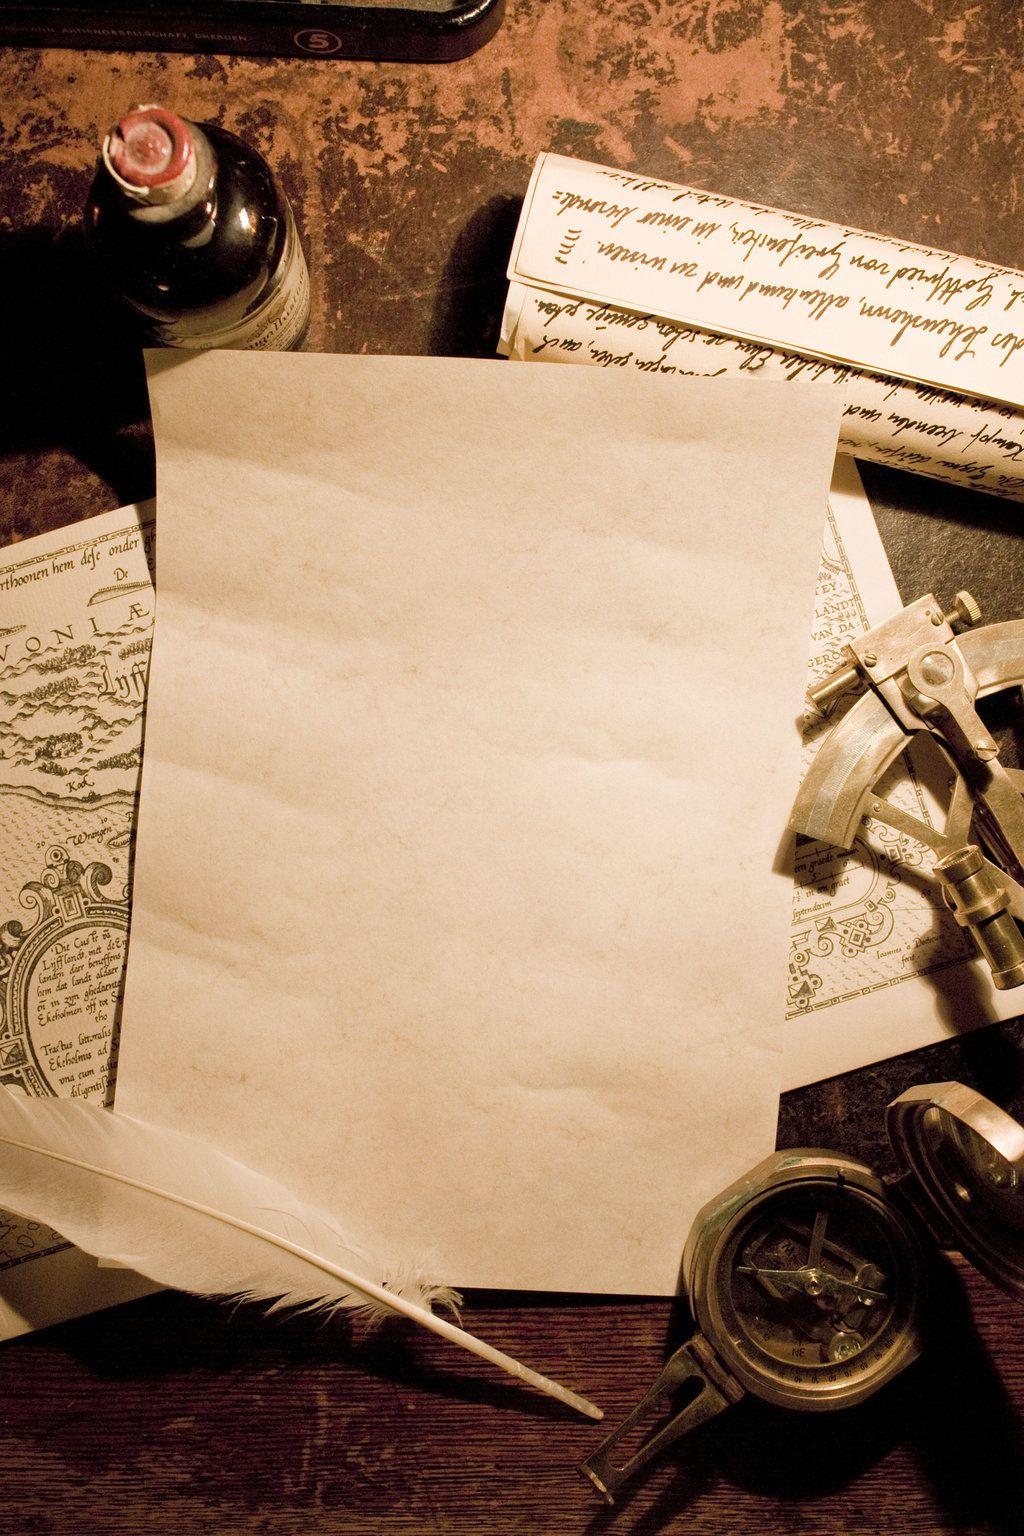 A Pirate S Letter Stock By Jantiff Stocks Deviantart Com On Deviantart Letter Photography Powerpoint Background Design Lettering